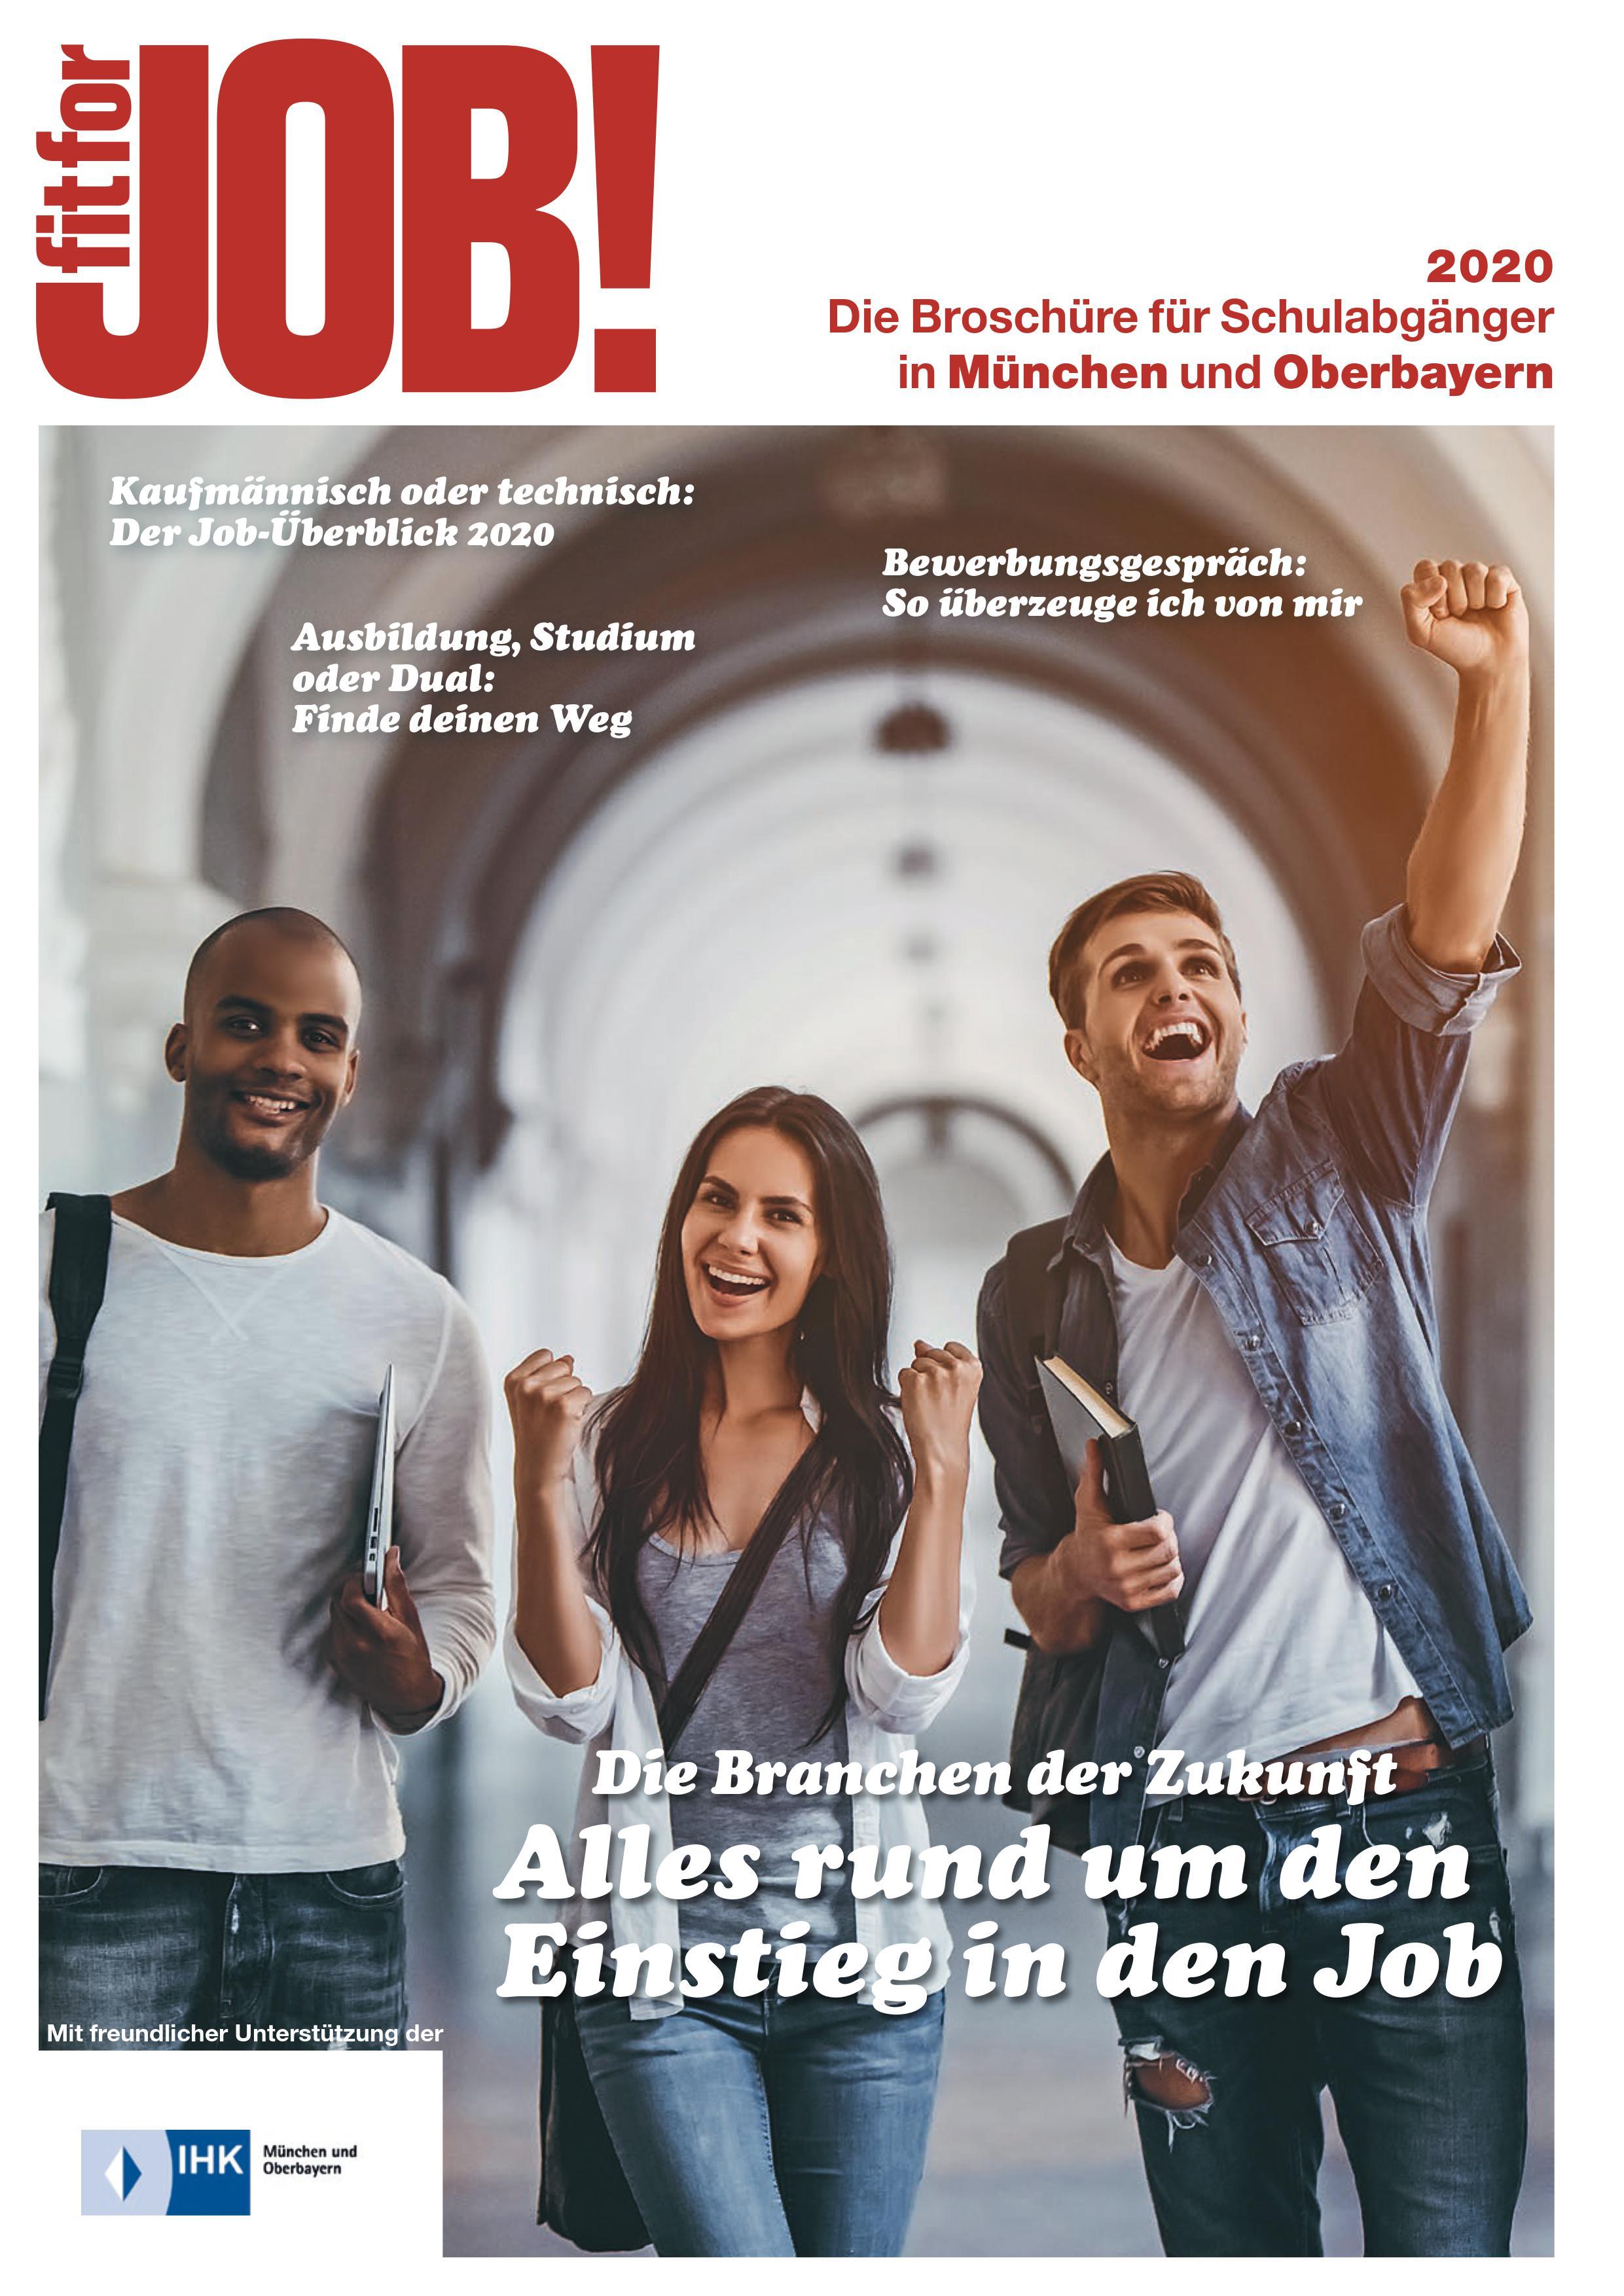 https://fitforjob-oberbayern.de/wp-content/uploads/2019/09/München-2020.jpg